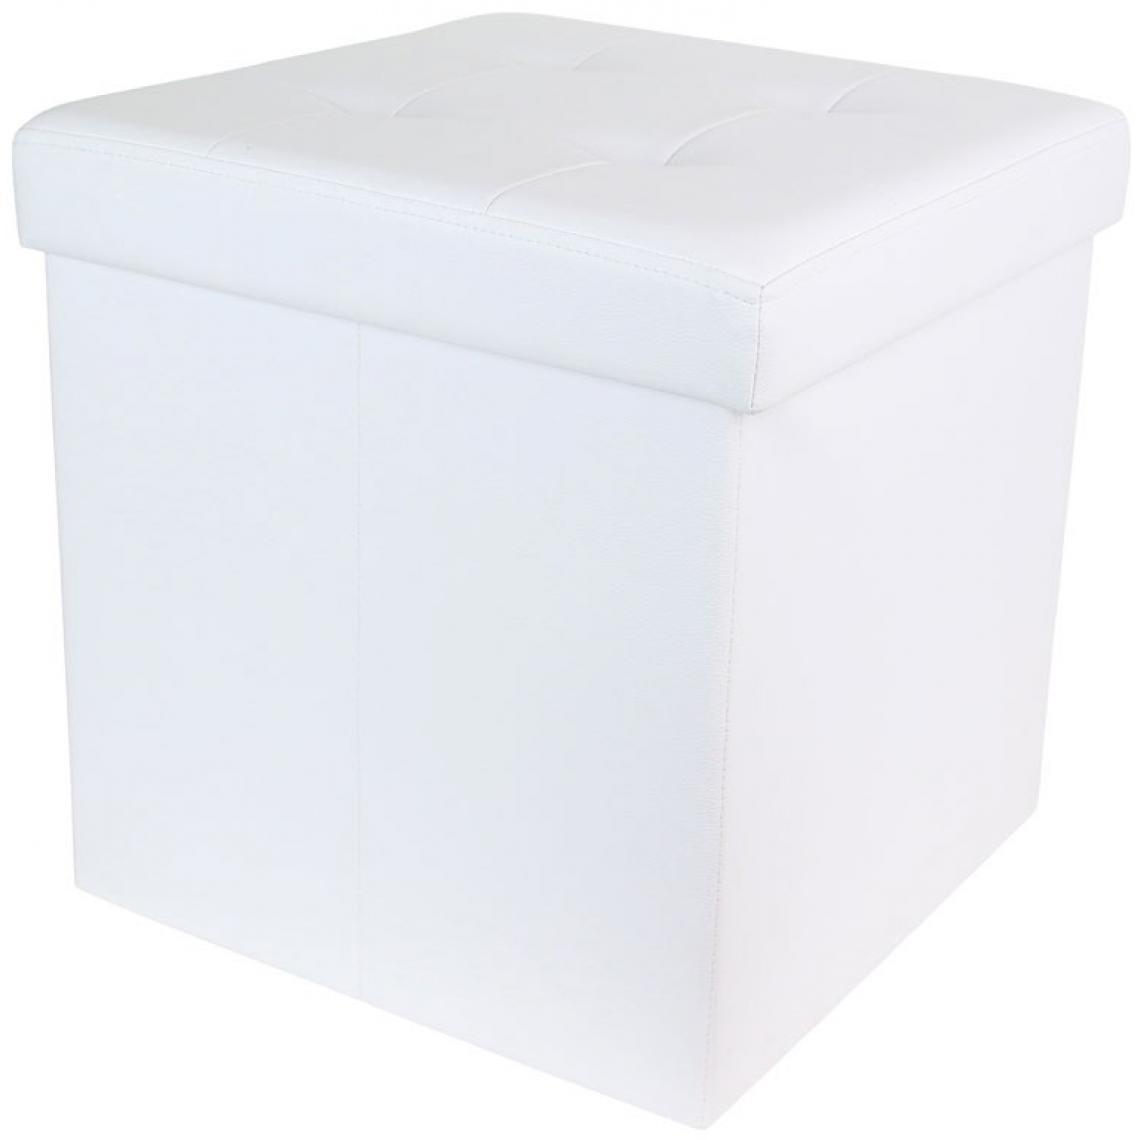 3S. x Home Coffre Pouf Pliable Blanc Impression Cuir ESSY